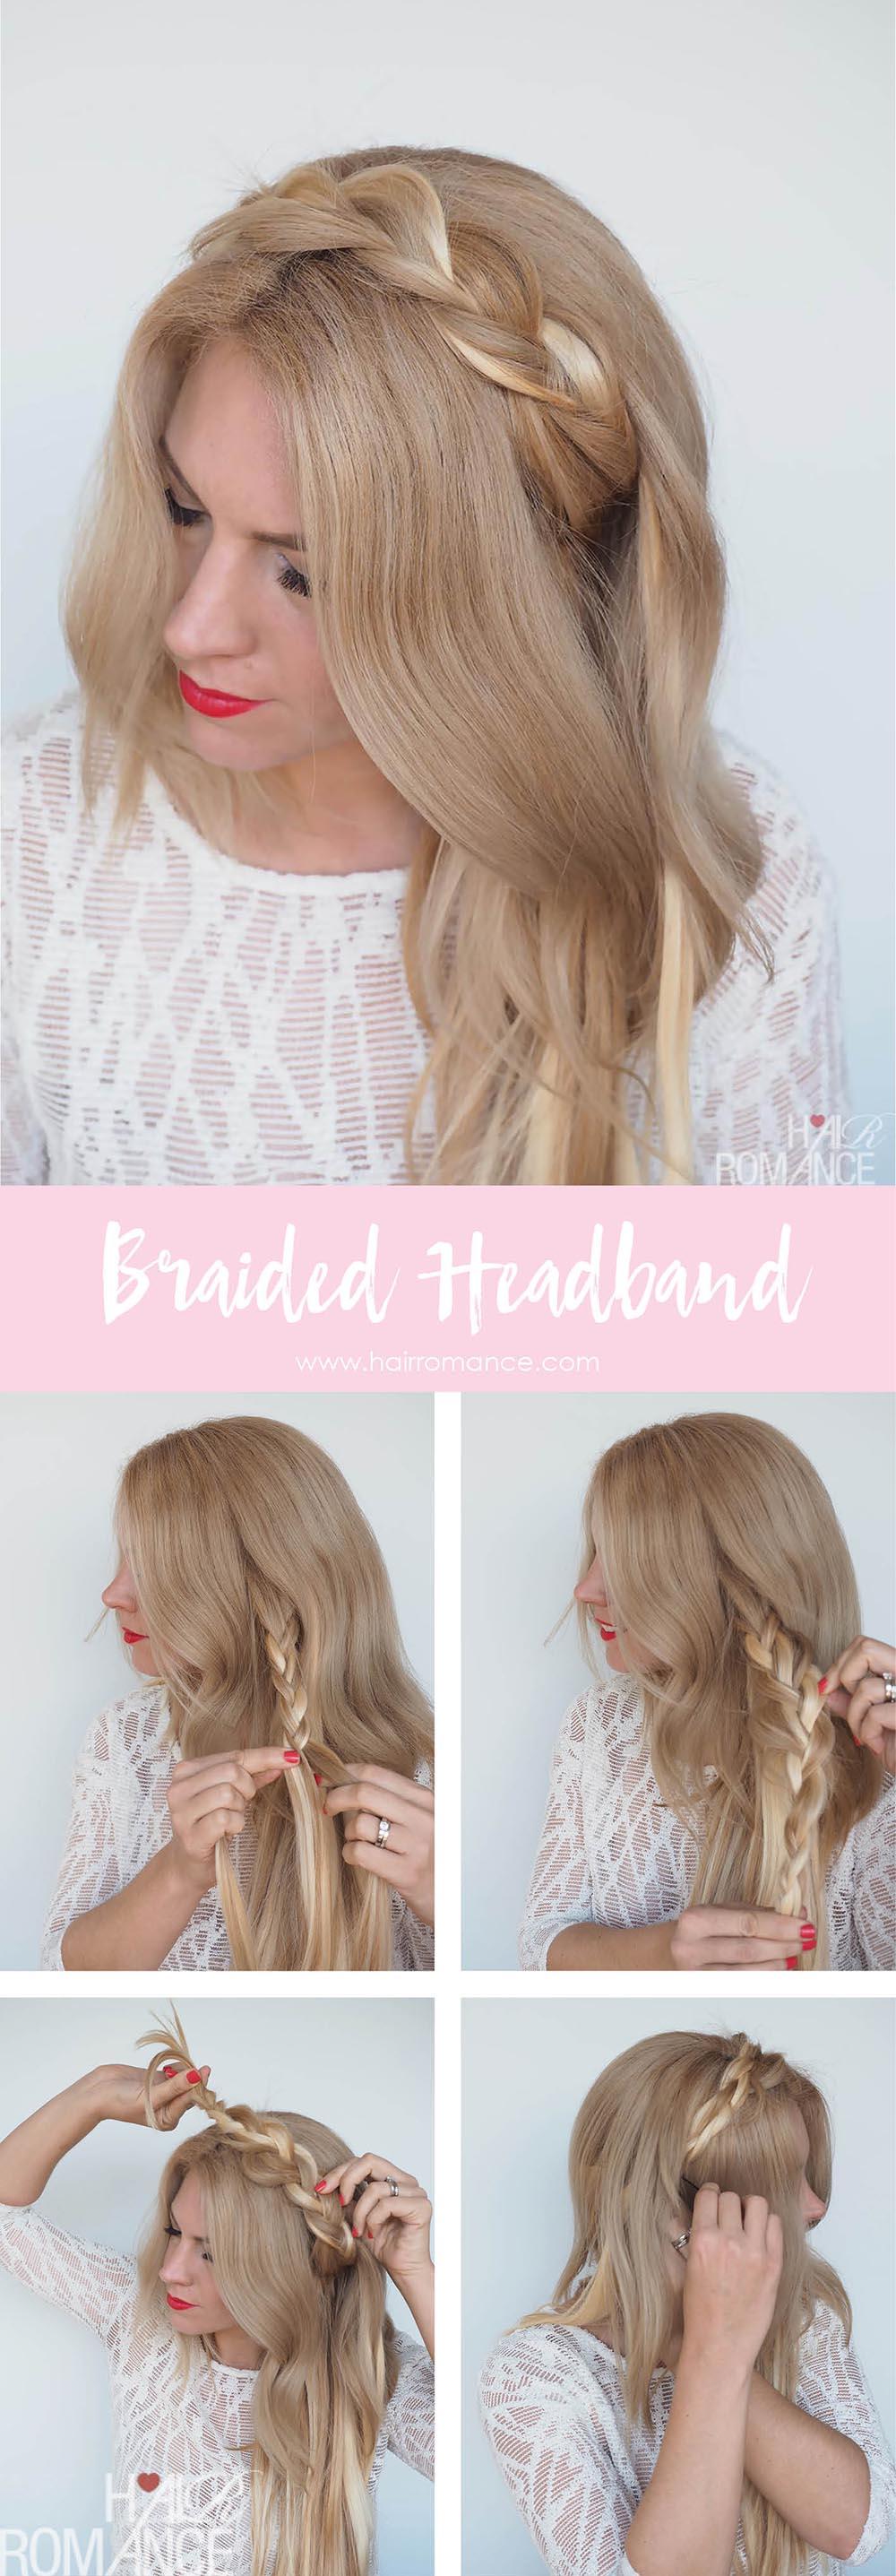 Braided Headband Hairstyle Tutorial Hair Romance